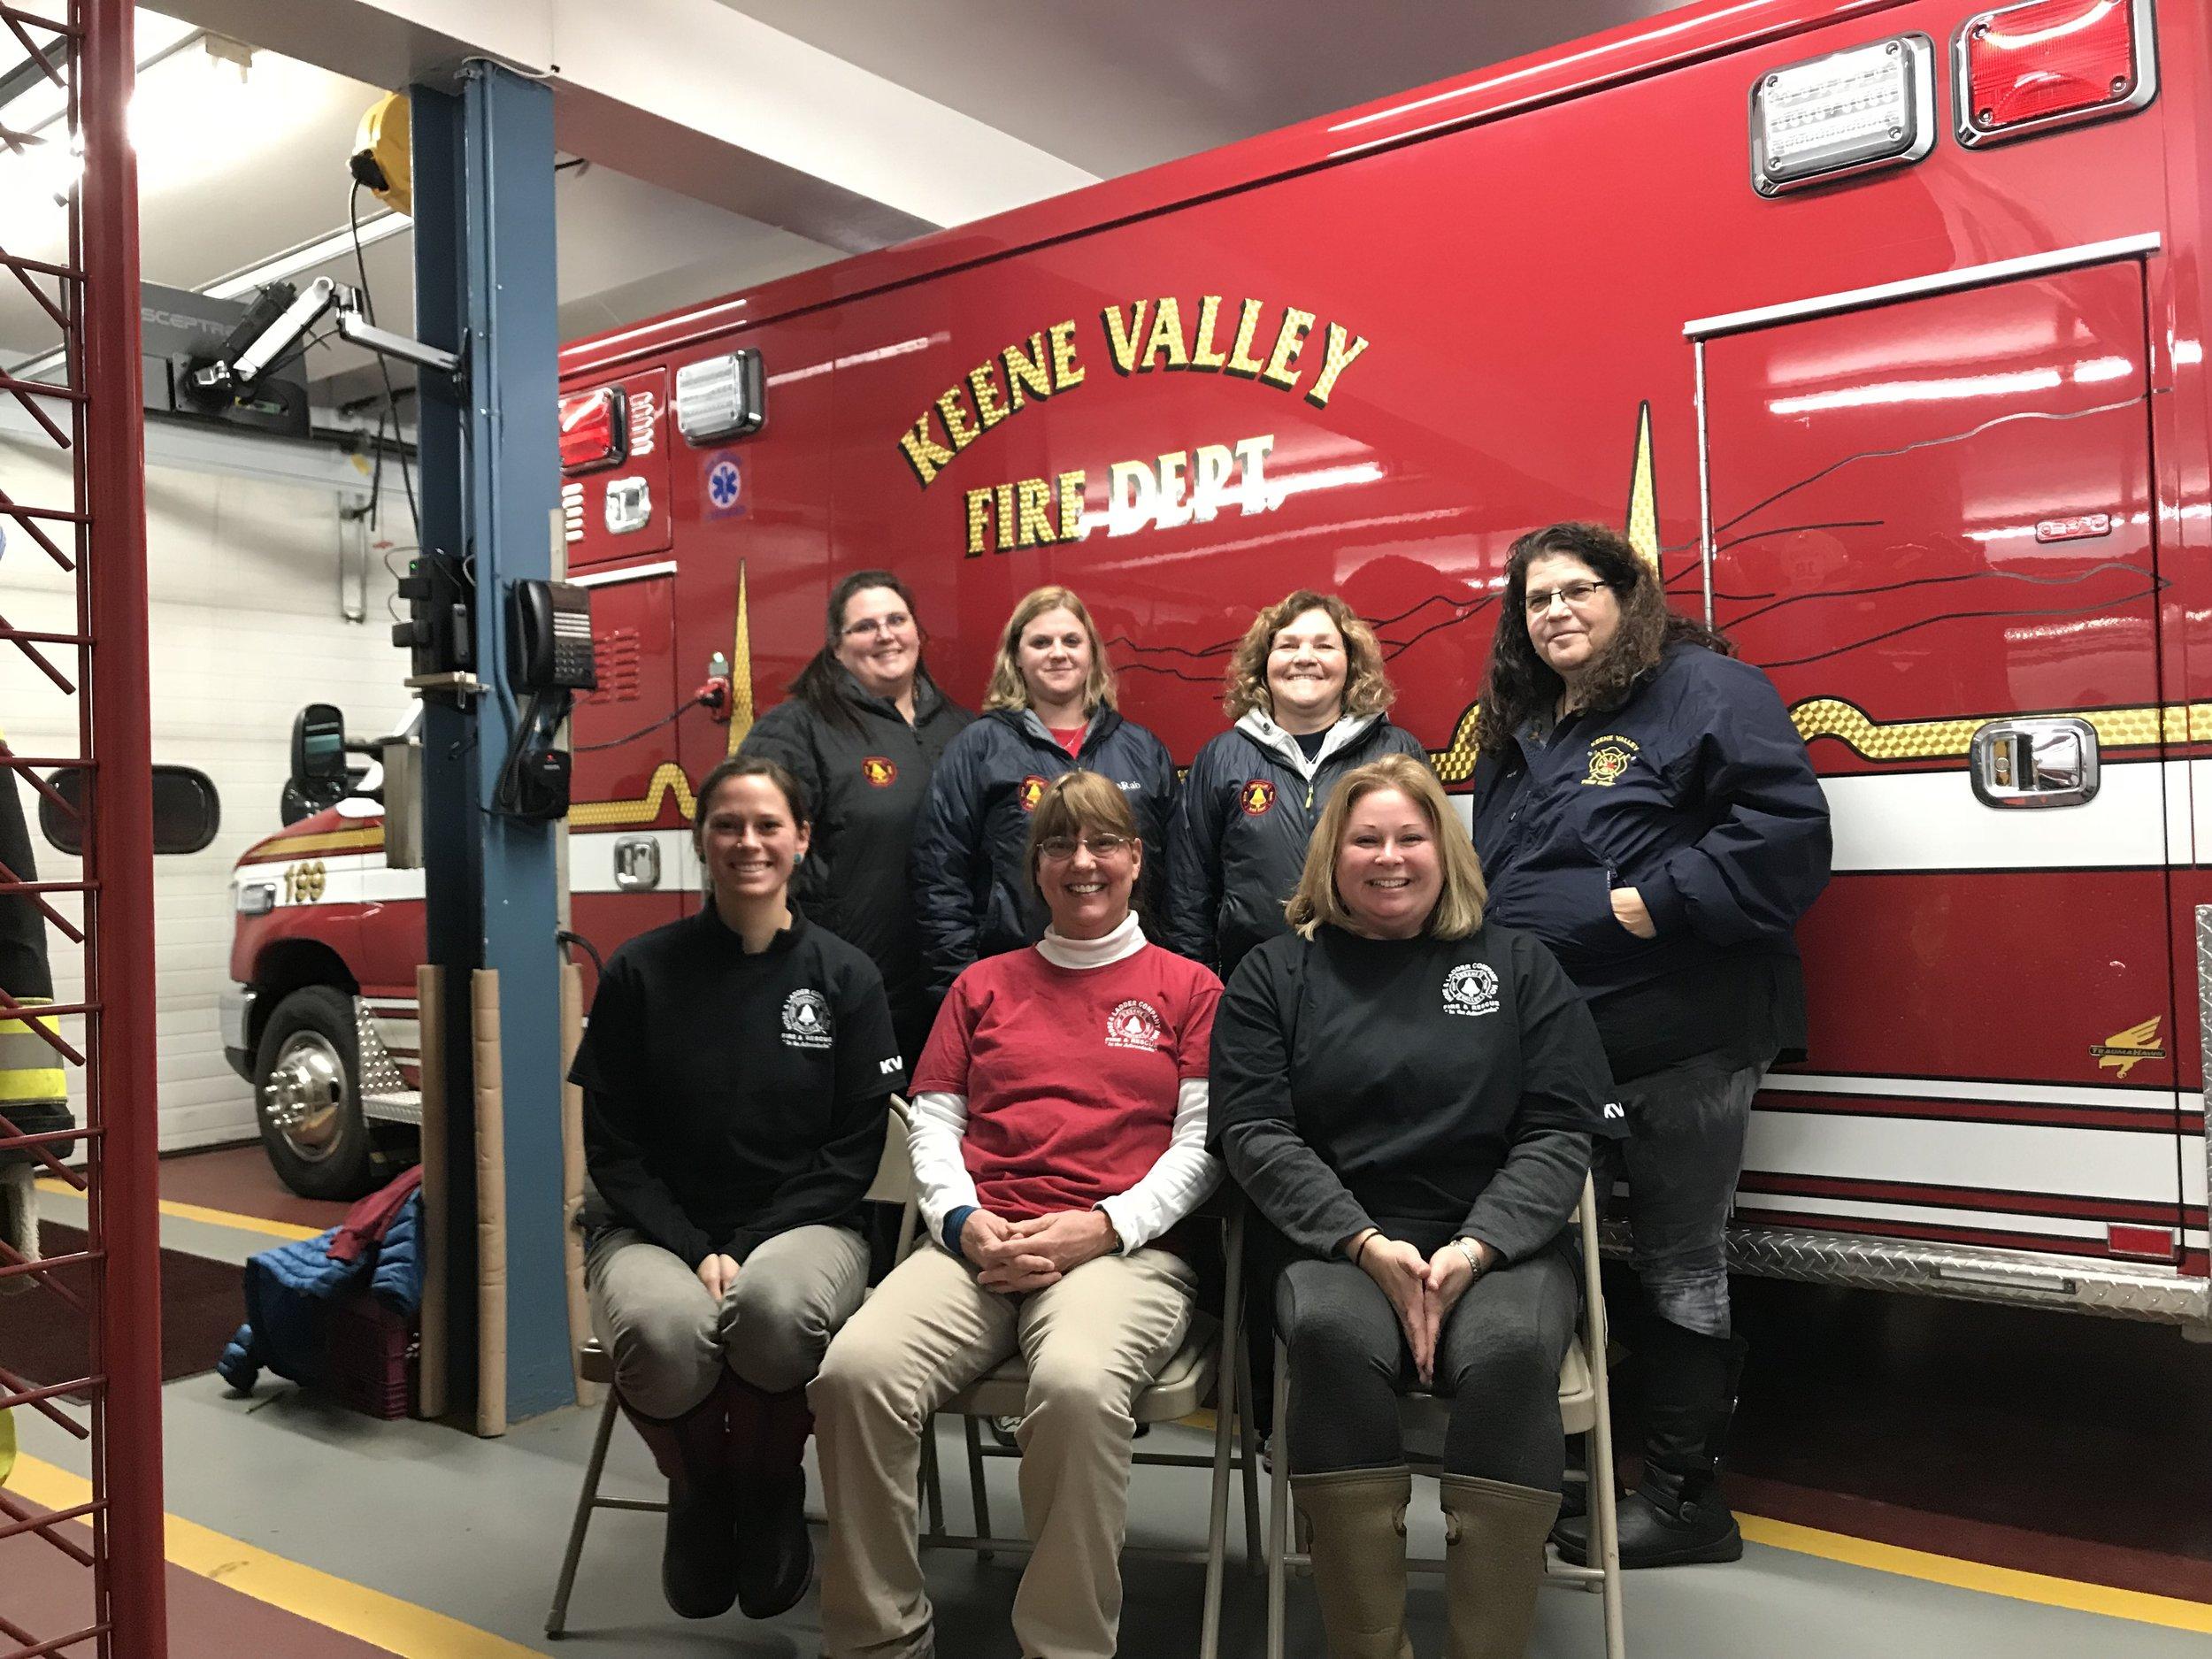 Back row:  Dawn Ormsby, Heather DeZalia, Linda Hudson, Jodi Downs  Front Row:  Erin Pelkey, Kelly Hall, Stephani Tansey